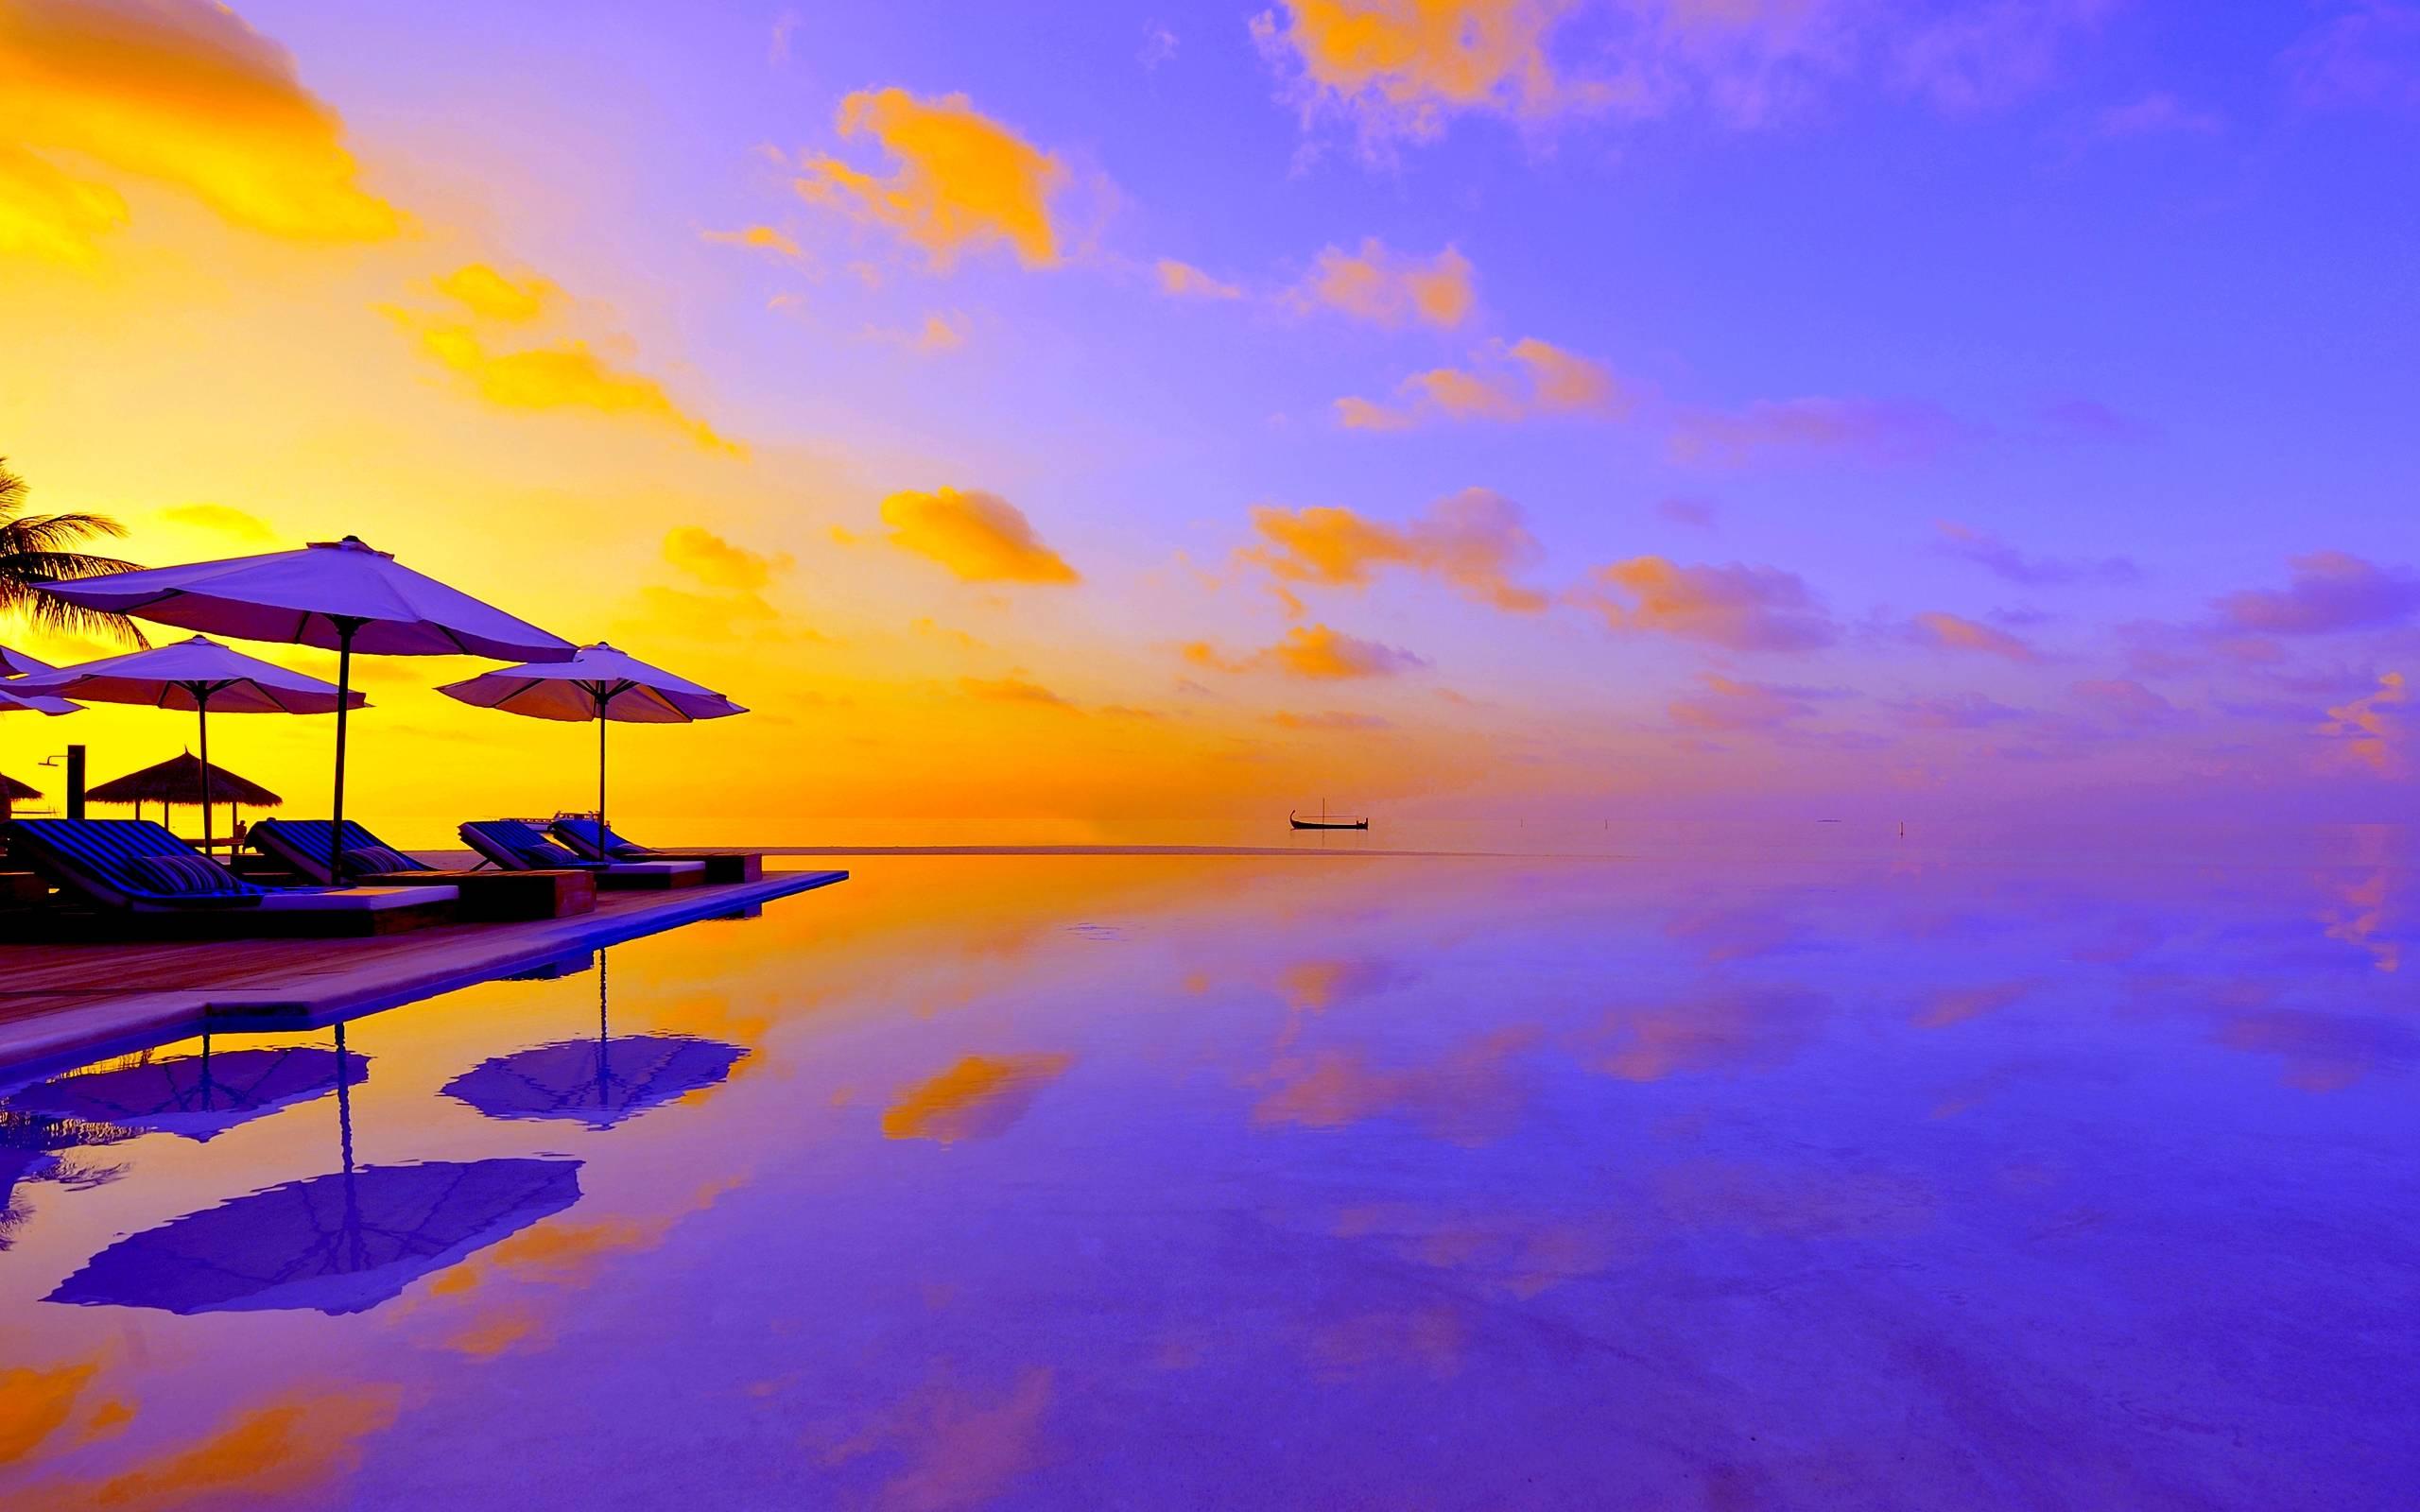 Summer Backgrounds Pictures For Desktop 2560x1600